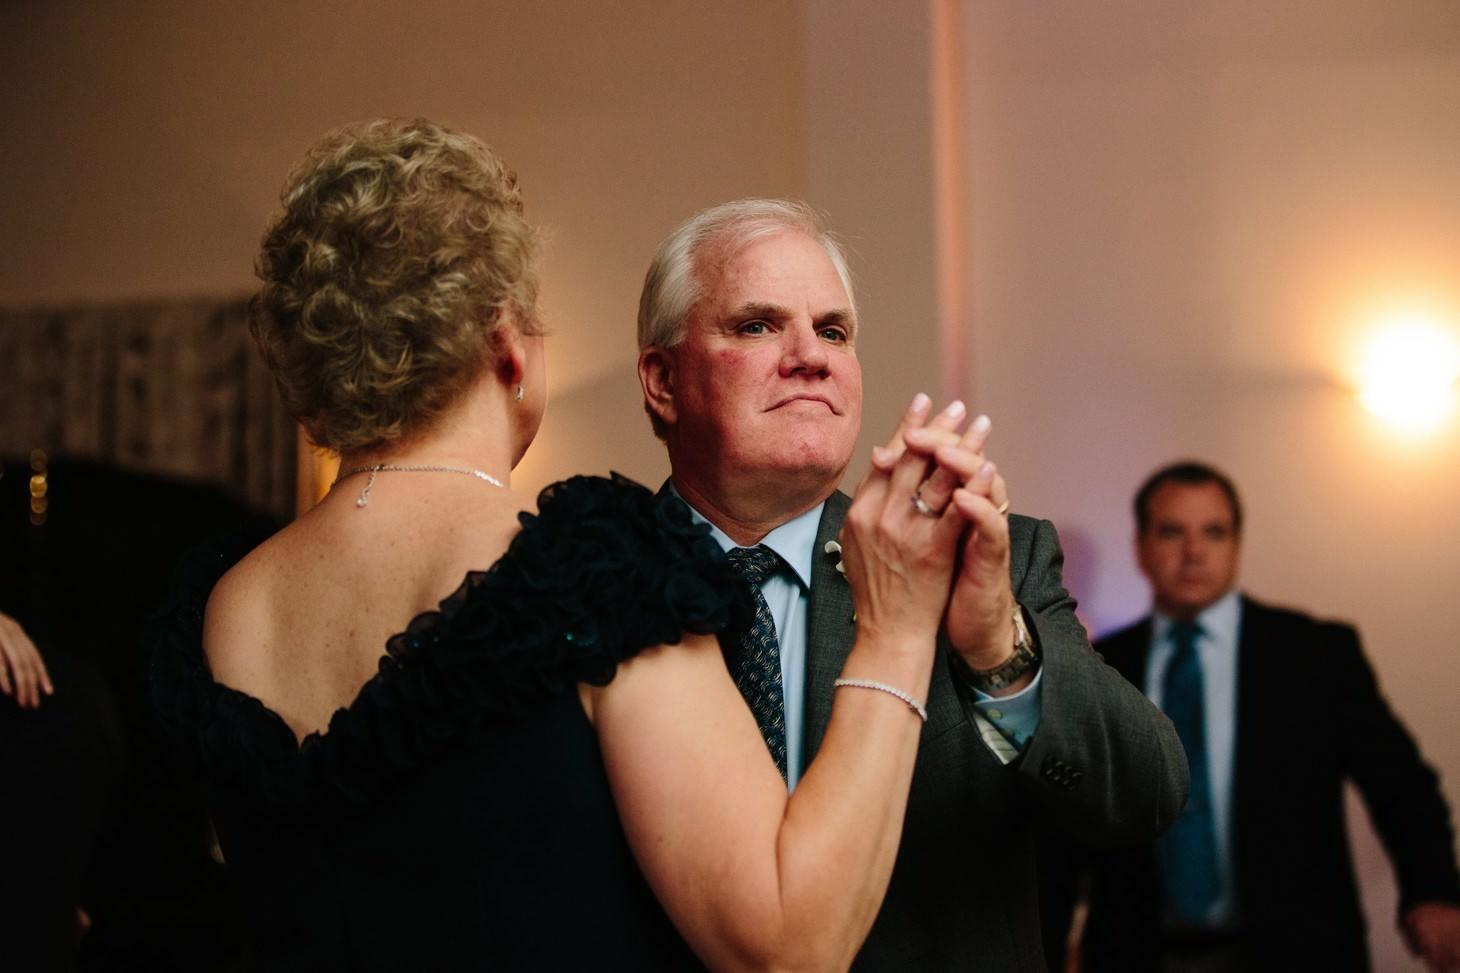 039-nyc-wedding-photographer-nj-nerdy-dr-who-firehouse-wedding-smitten-chickens.jpg